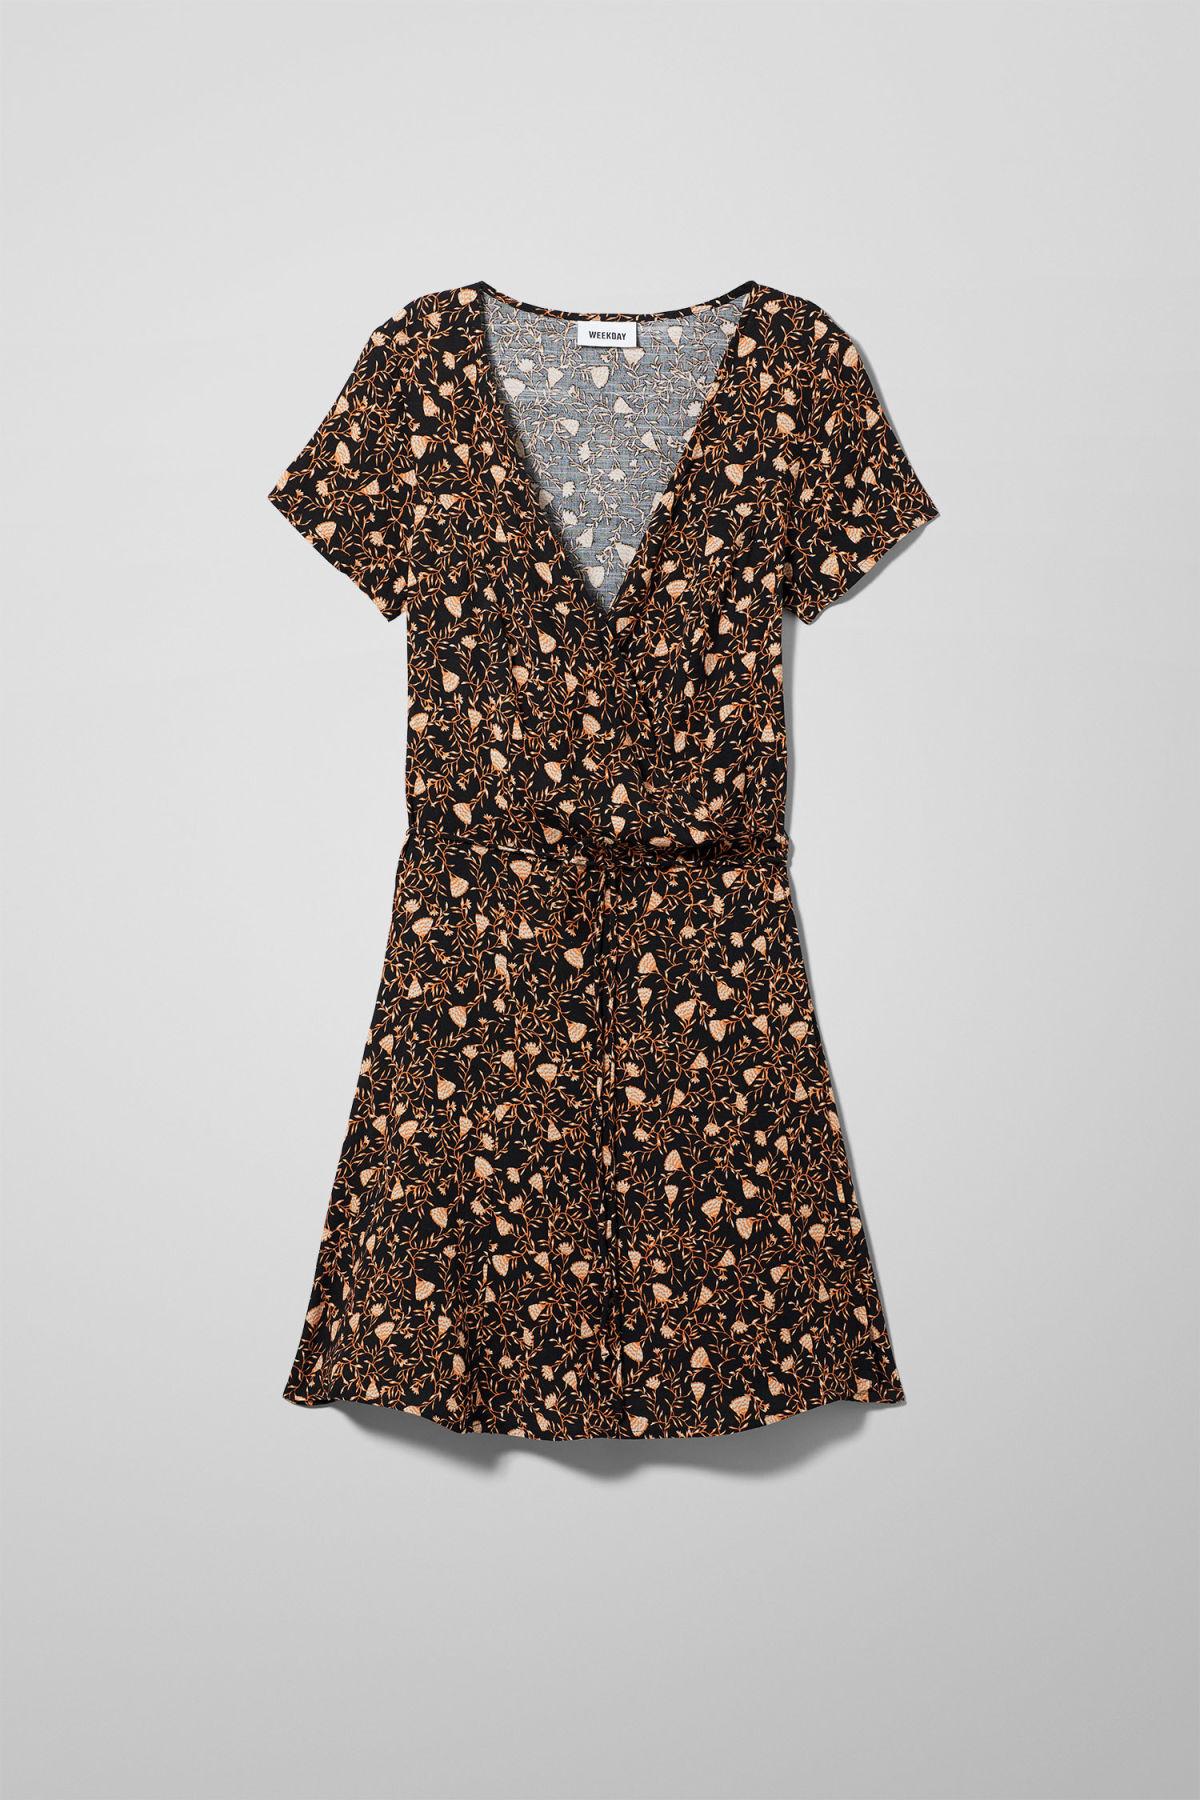 Image of Imogen Wrap Dress - Black-38